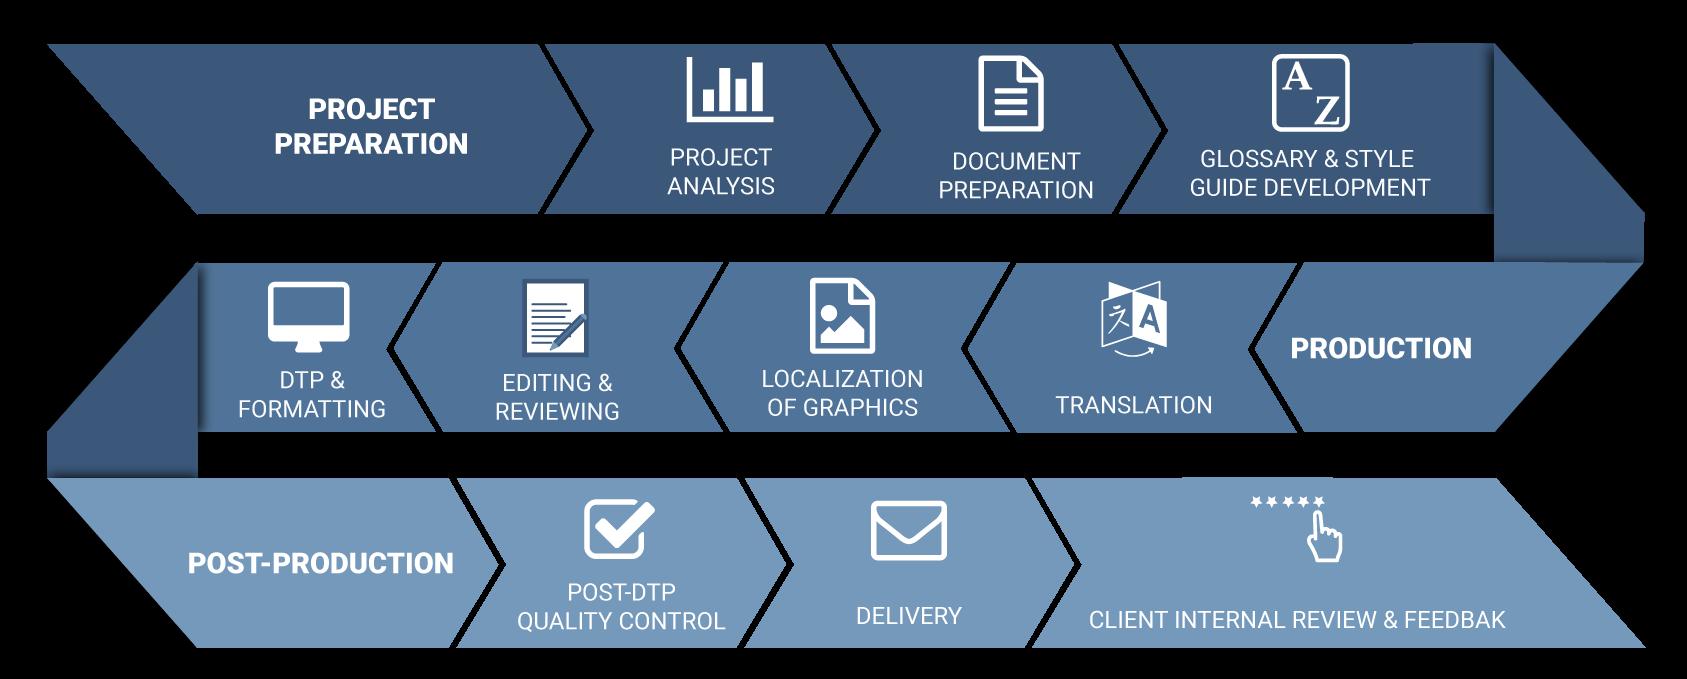 Translation Services - Translation and QA Process